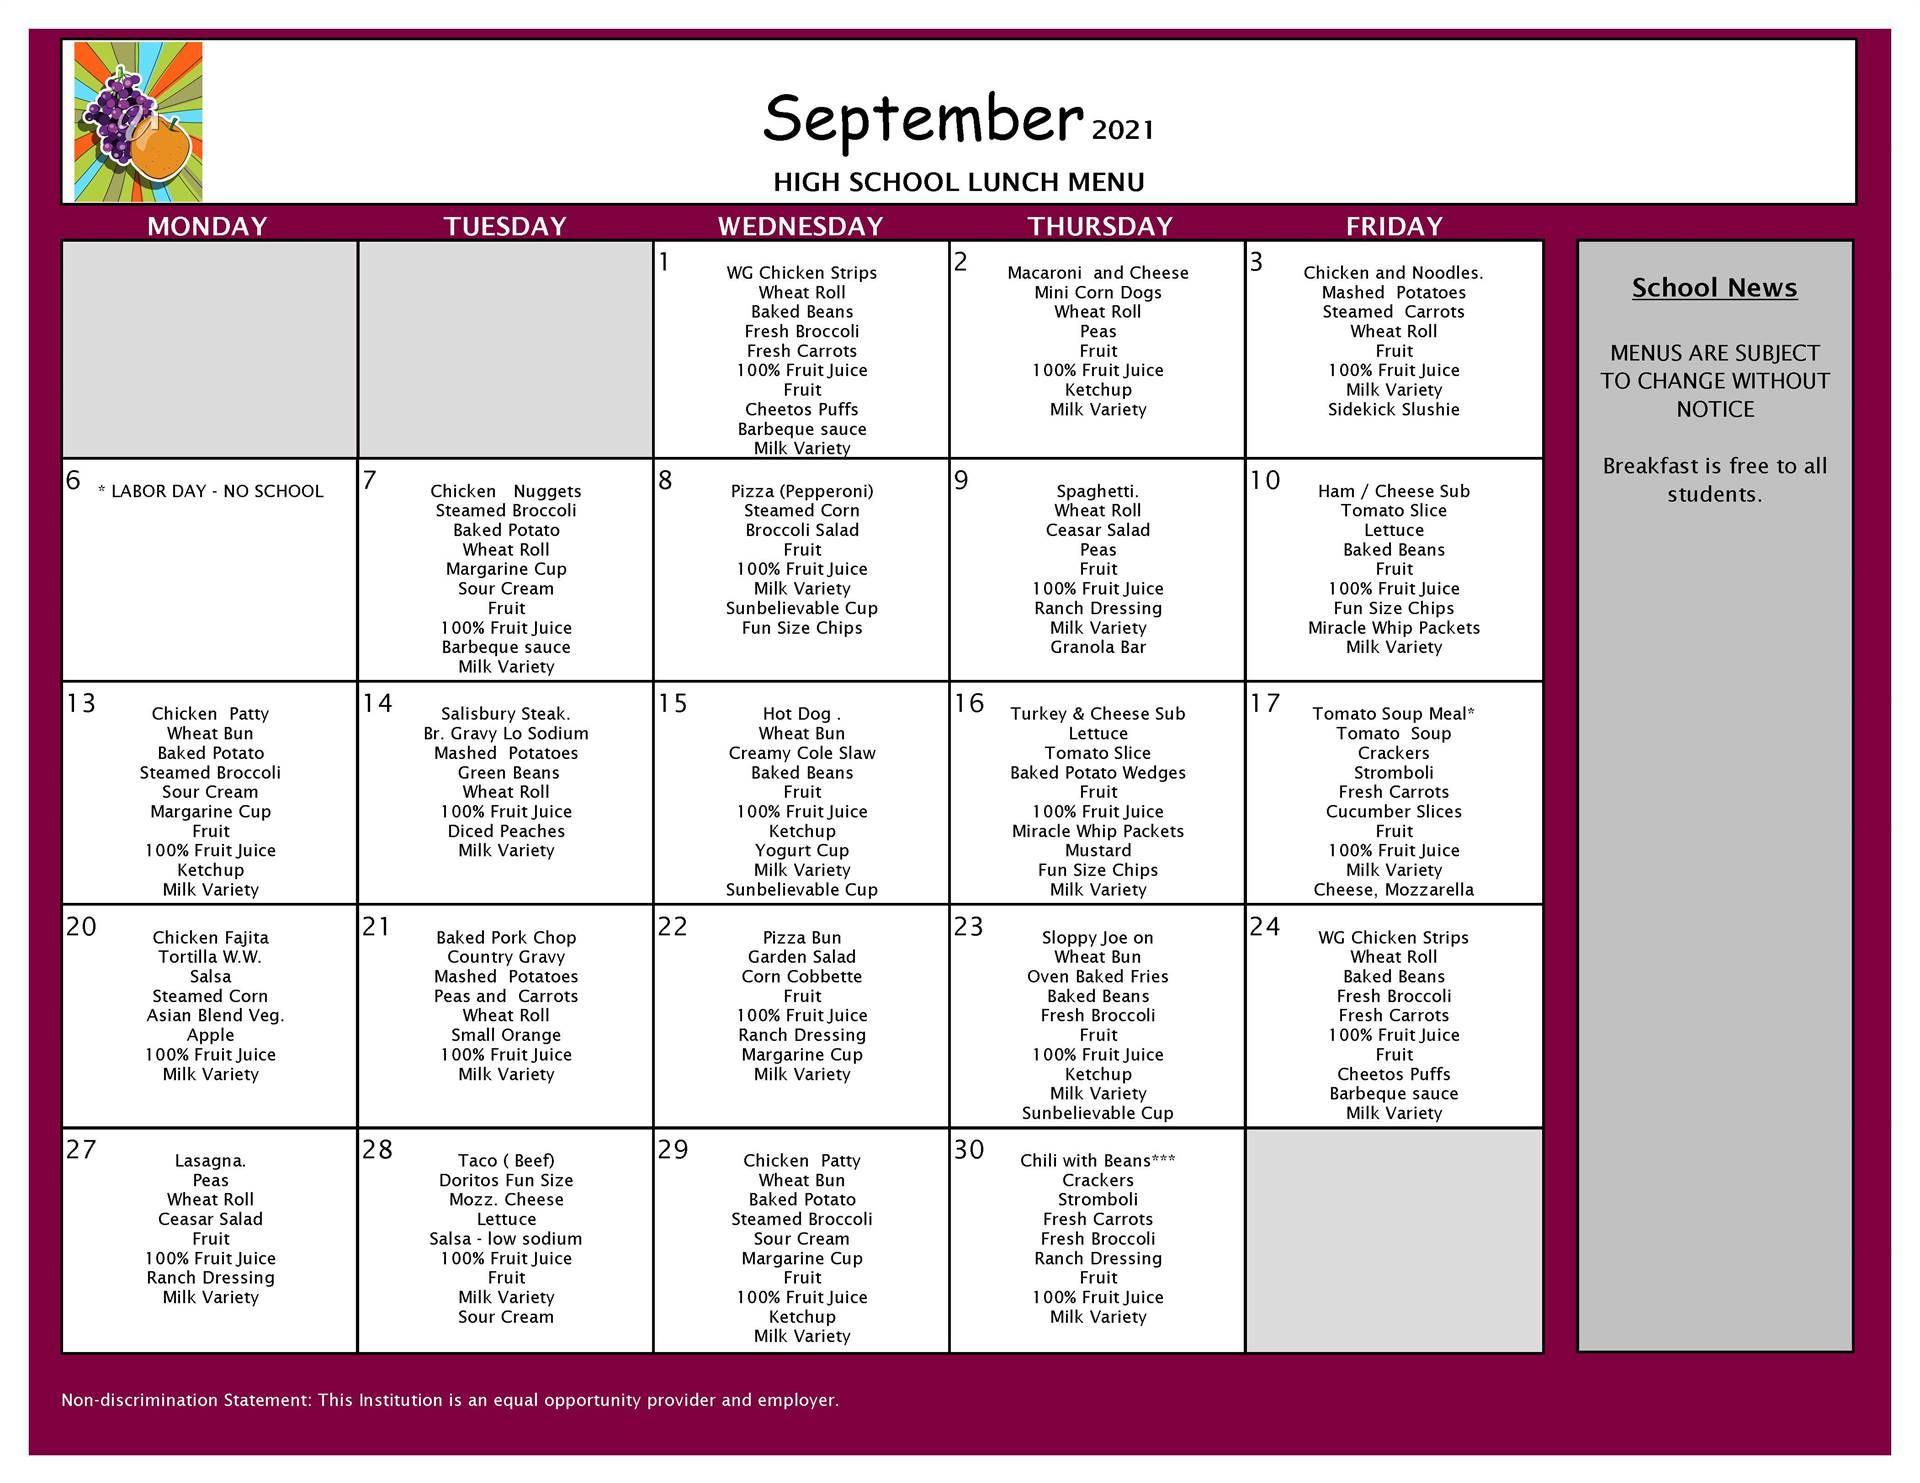 September Lunch Menu 9-12